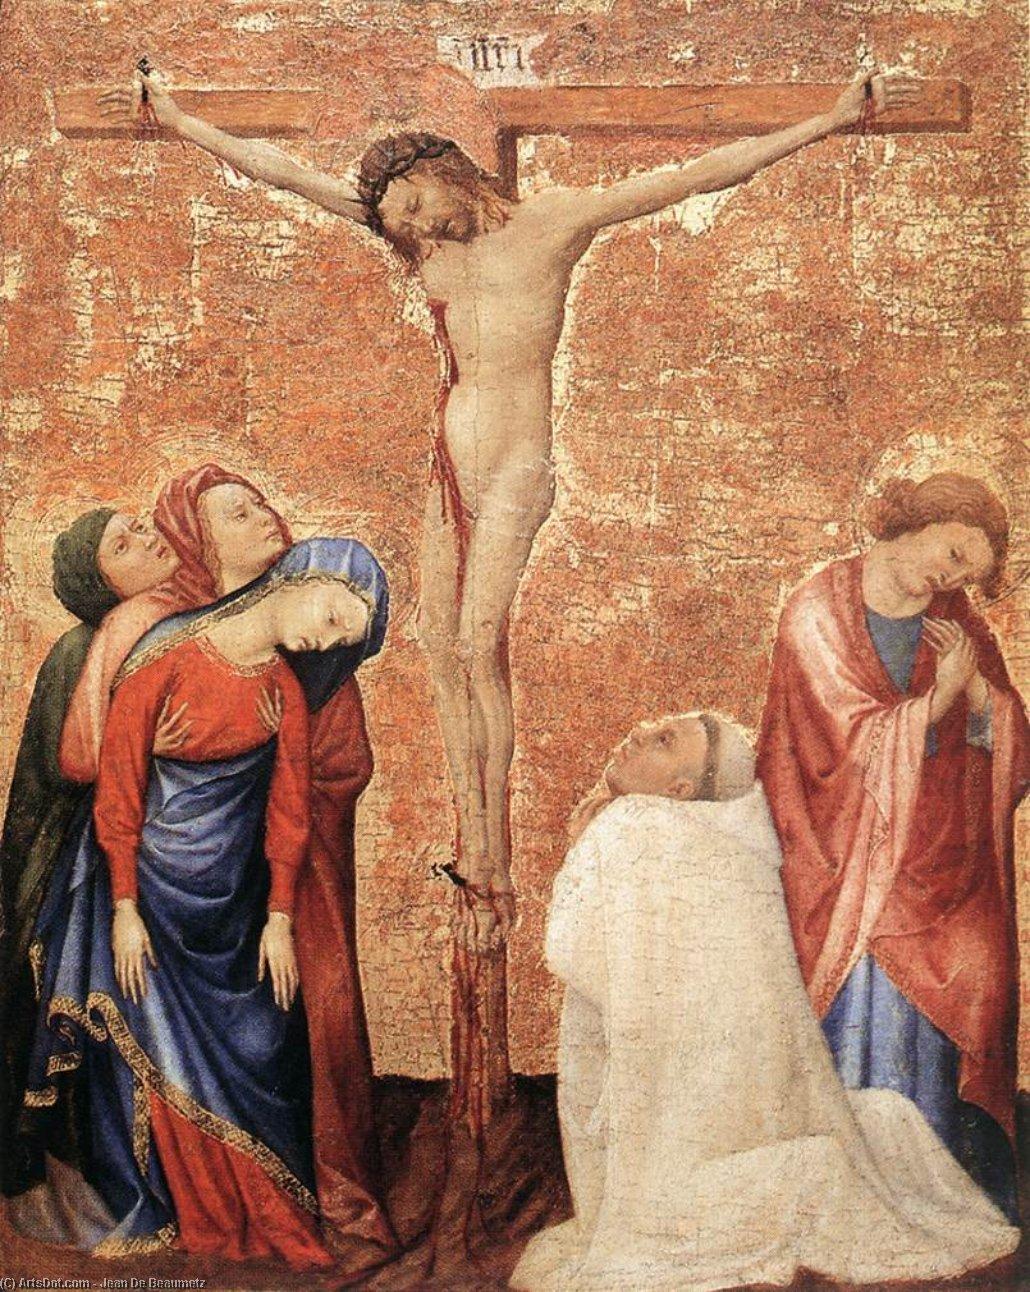 WikiOO.org - Enciklopedija dailės - Tapyba, meno kuriniai Jean De Beaumetz - Christ on the Cross with a Carthusian Monk